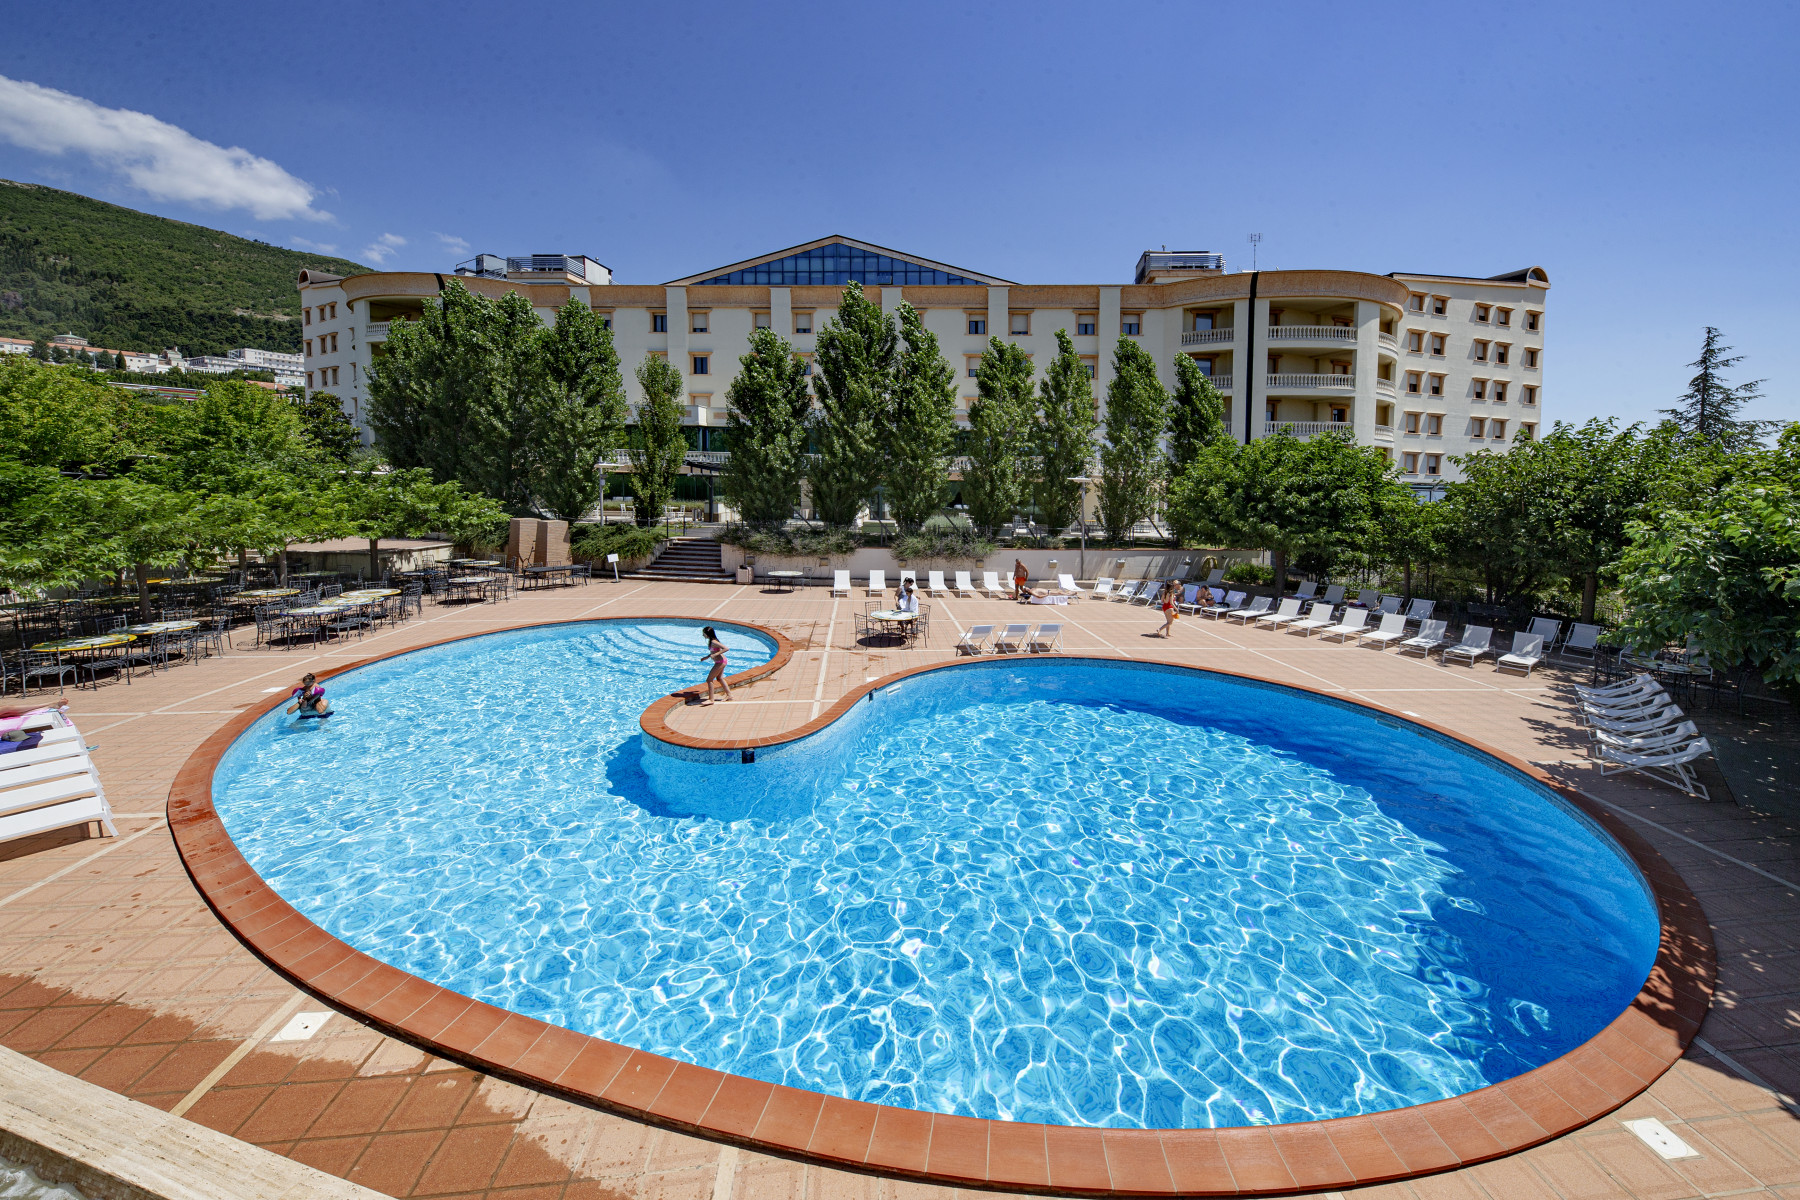 Offerta Bonus Vacanze 2020 in Hotel 4 Stelle a San ...